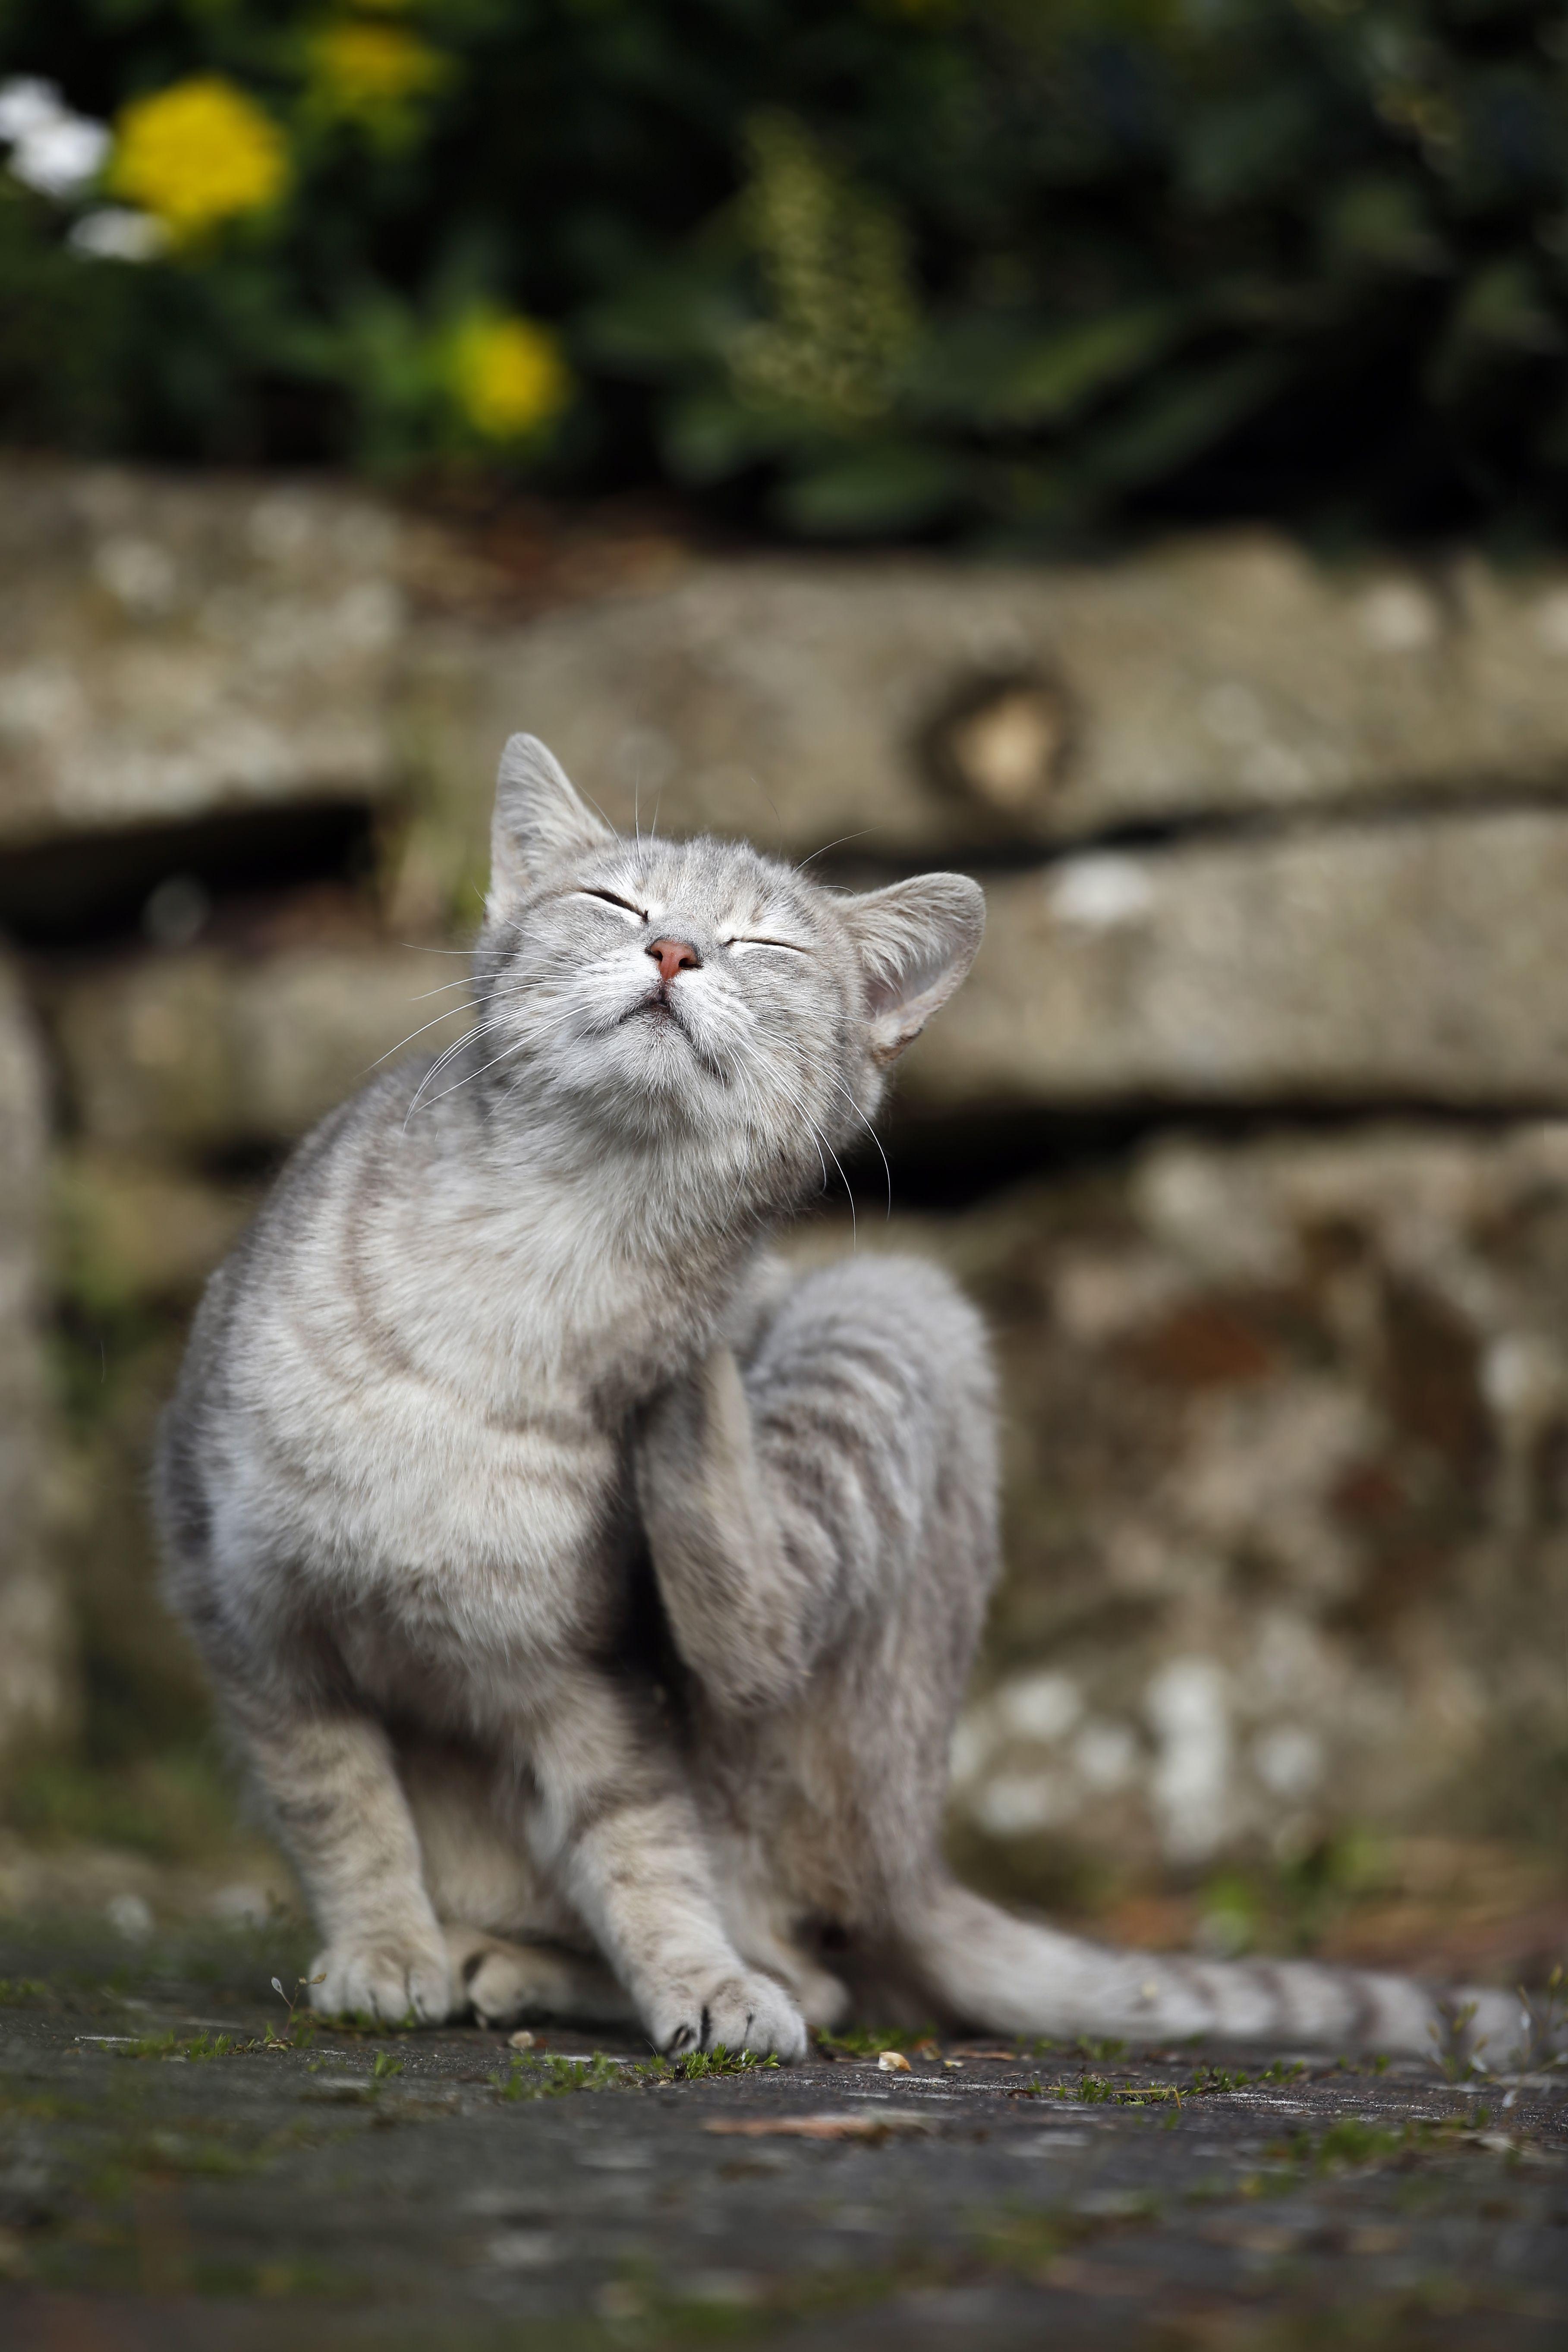 Germany, Baden-Wuerttemberg, Grey tabby cat, Felis silvestris catus, scratching